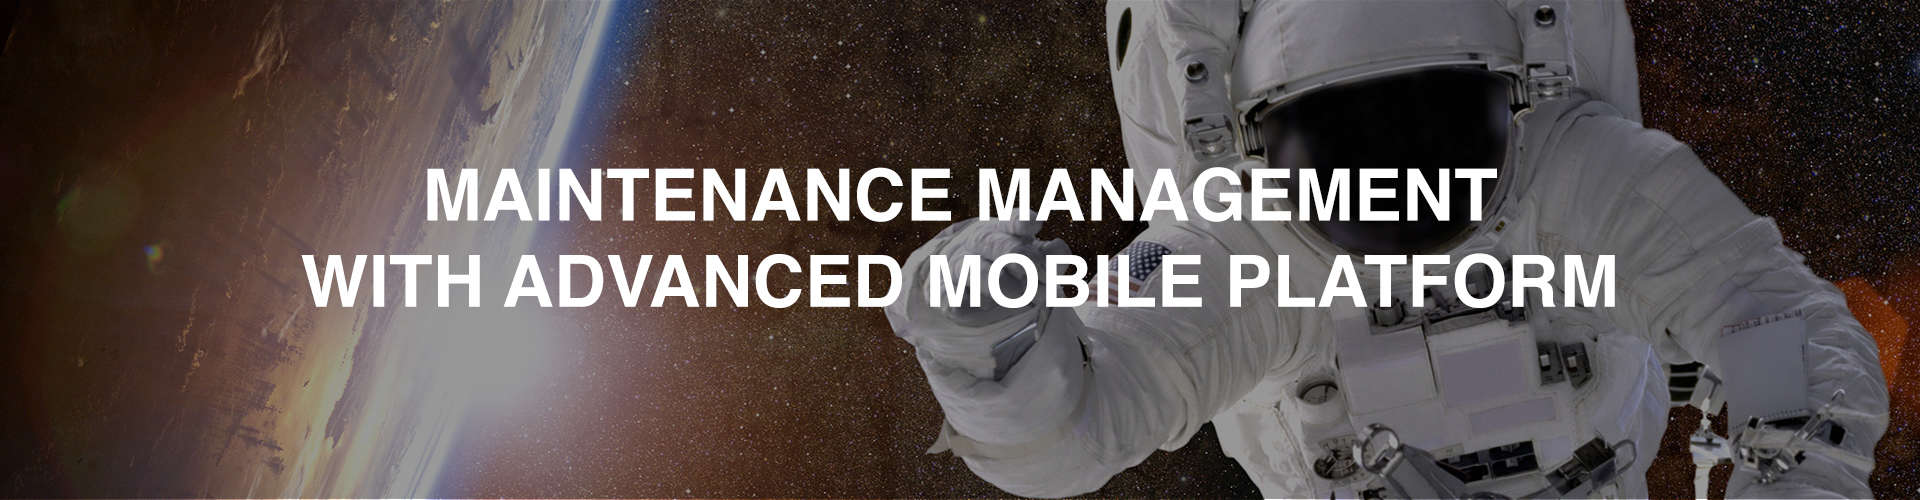 Maintenance Management With Advanced Mobile Platform